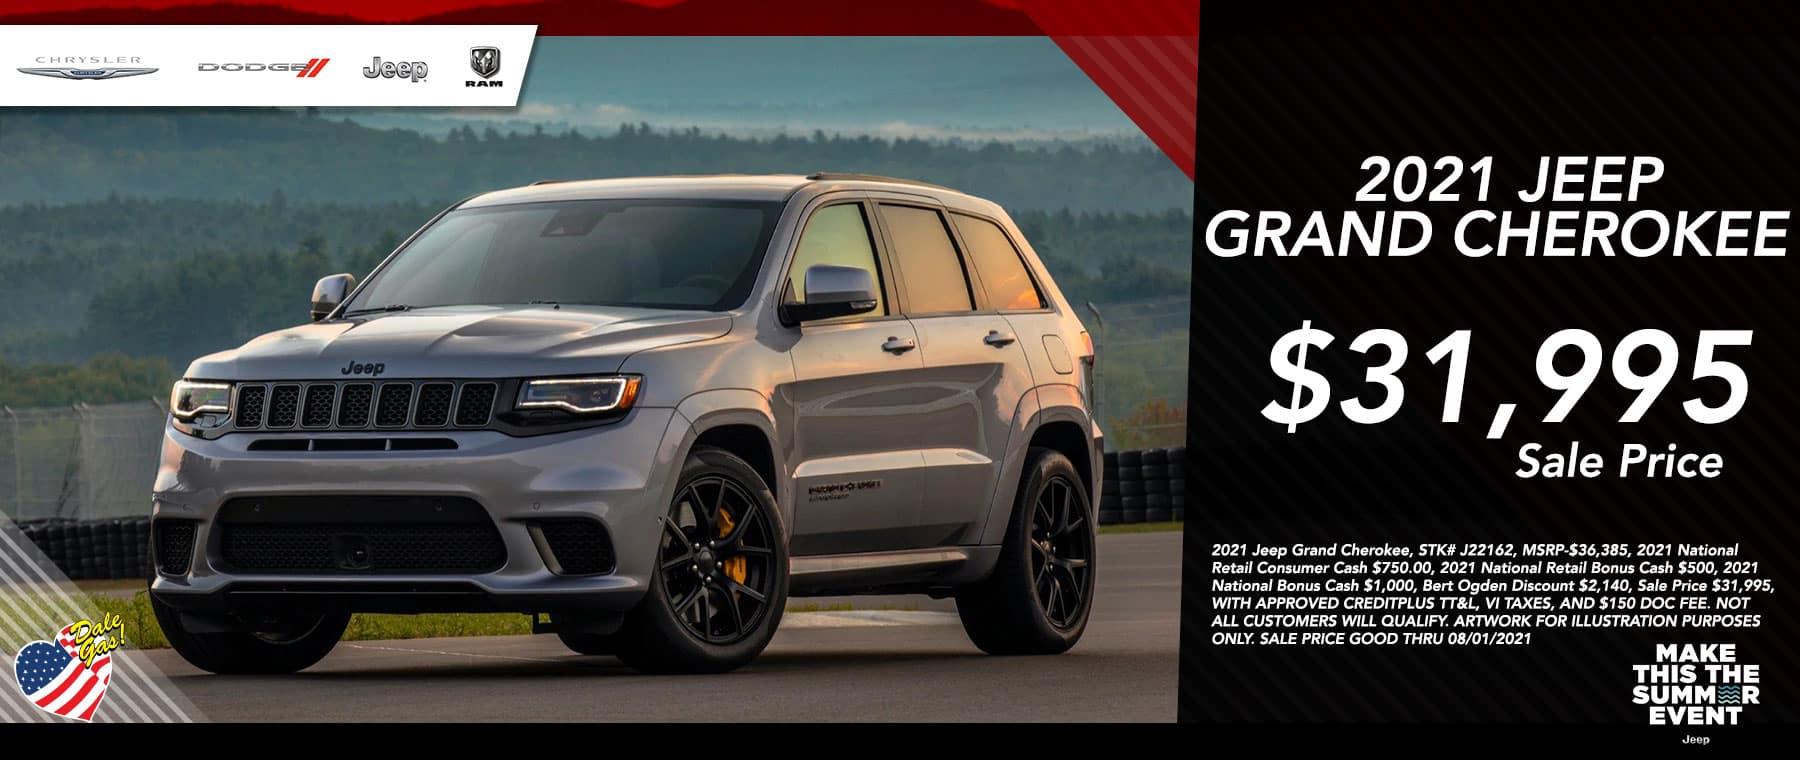 2021_Jeep_Grand_Cherokee